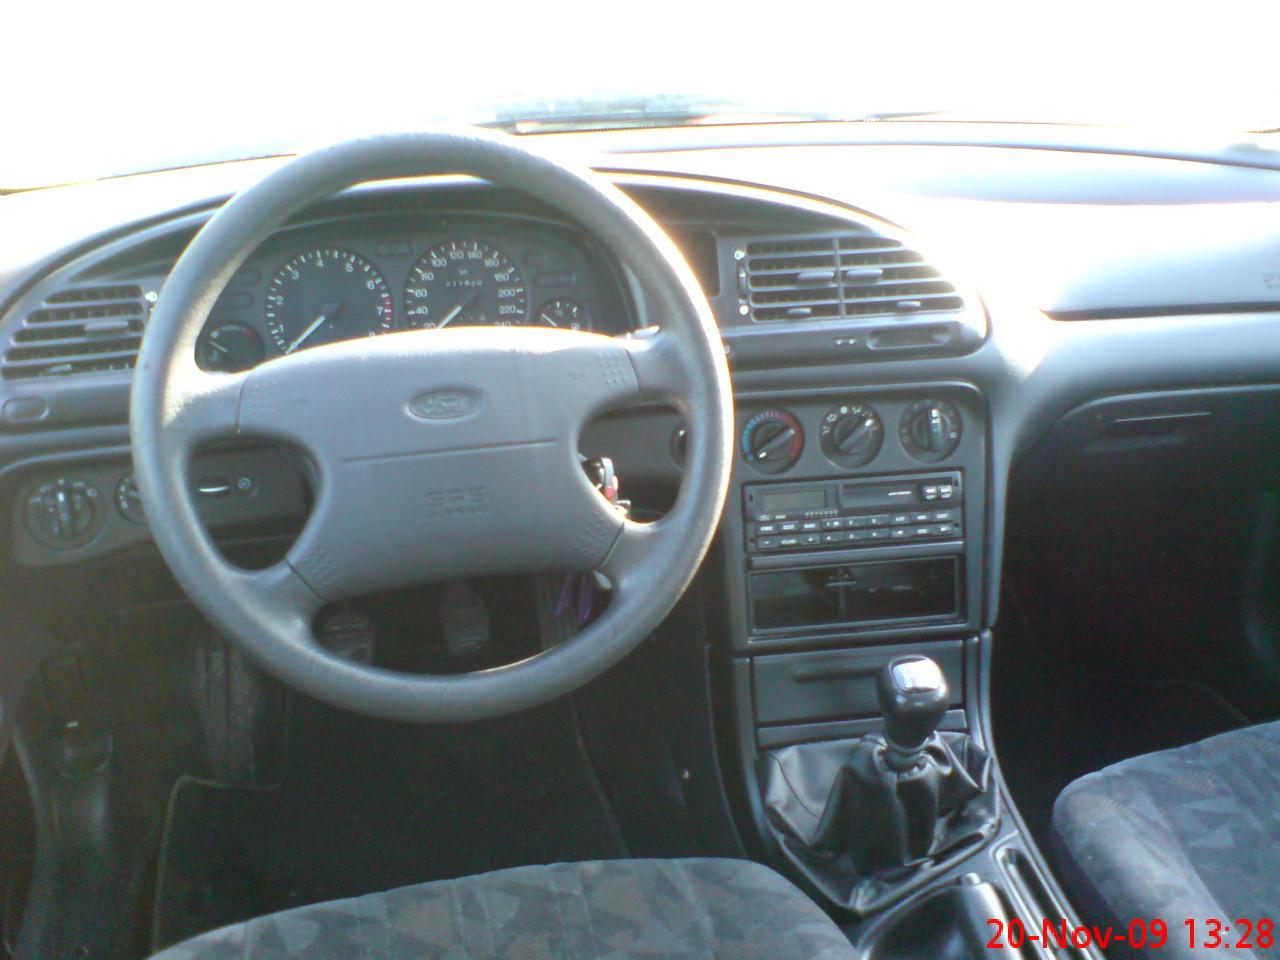 Mondeo 1.6 benzina  euro 2 import germania 2009